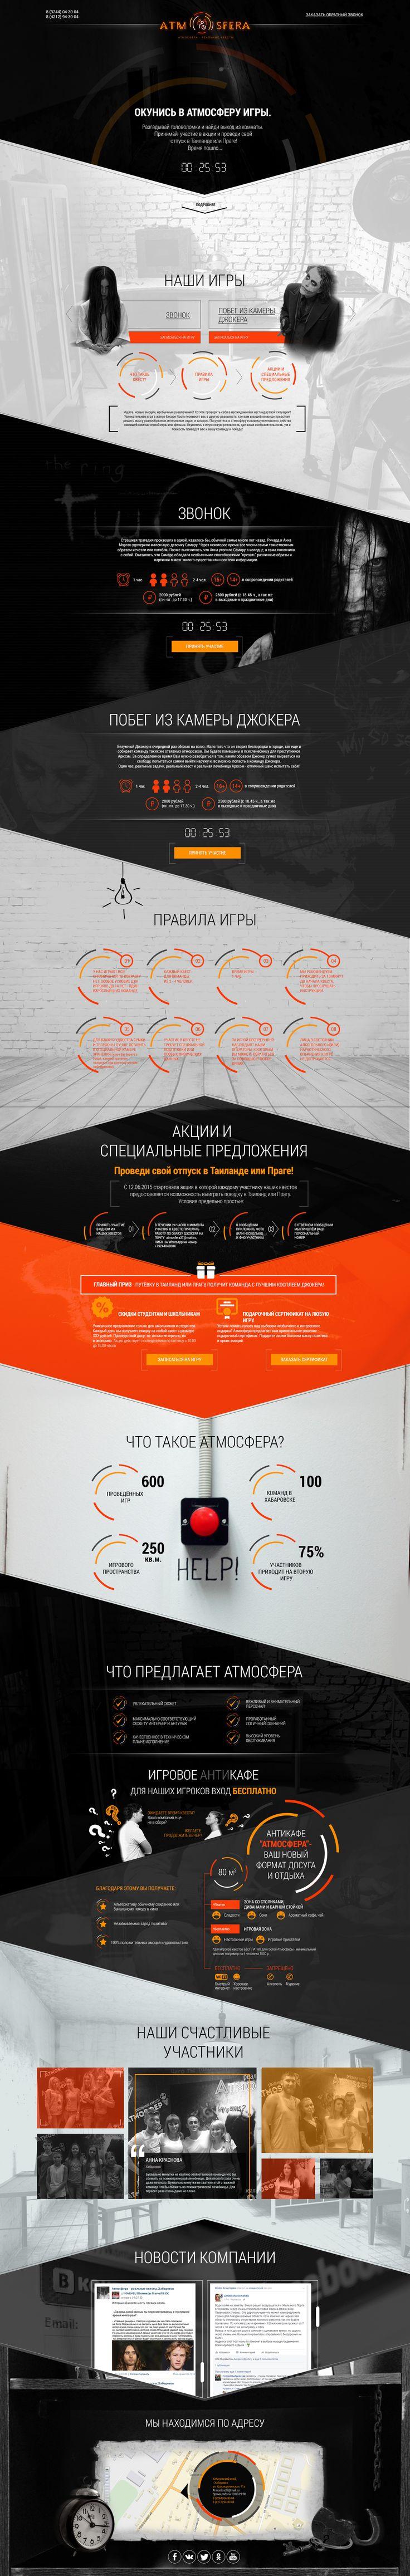 ATMOSFERA27 - Quest Room #landing, #page, #design, #web, #HTML5, #photoshop, #website